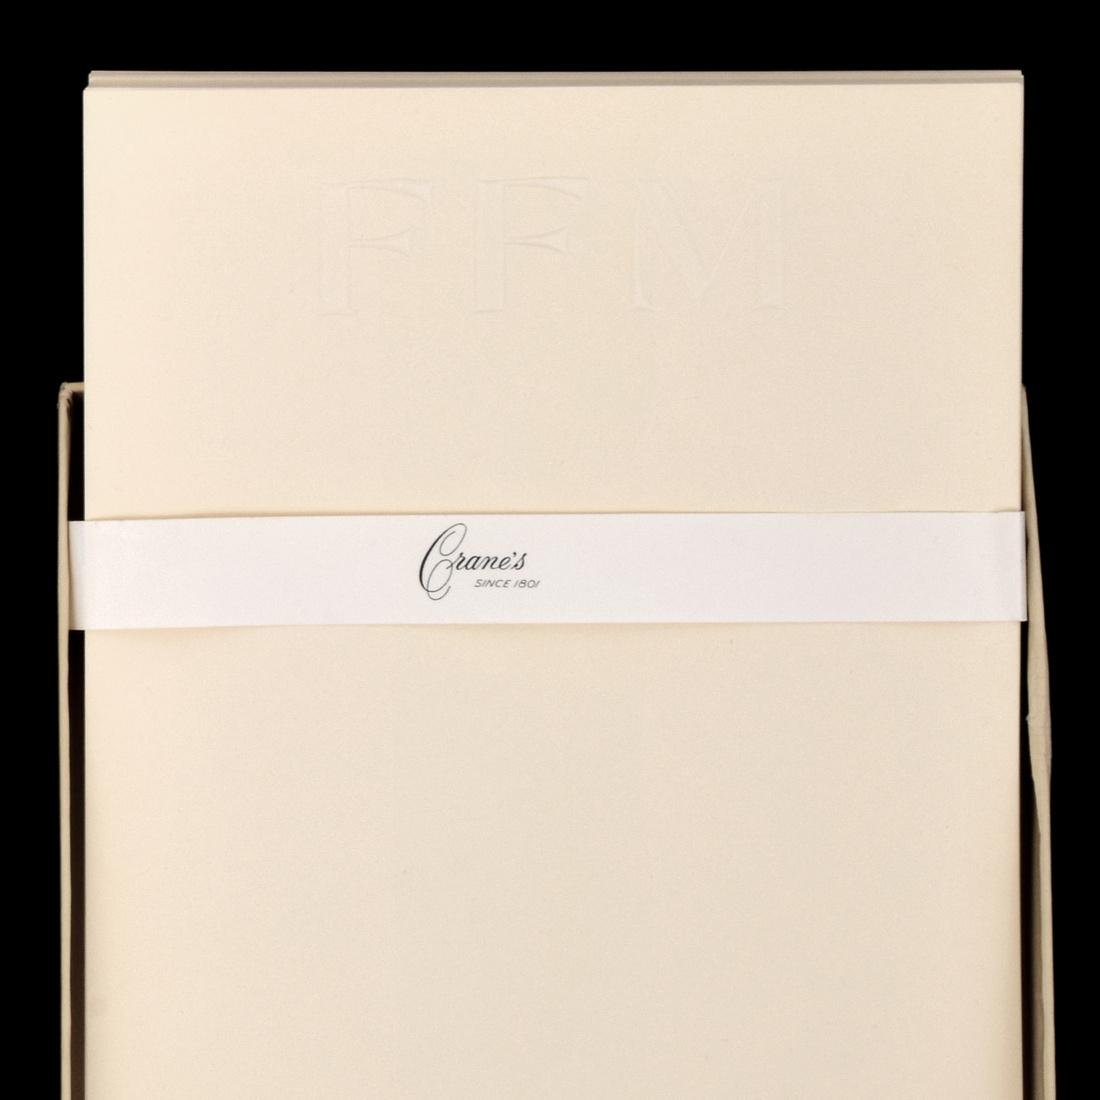 Farrah Fawcett Personal Monogrammed Stationery - 2